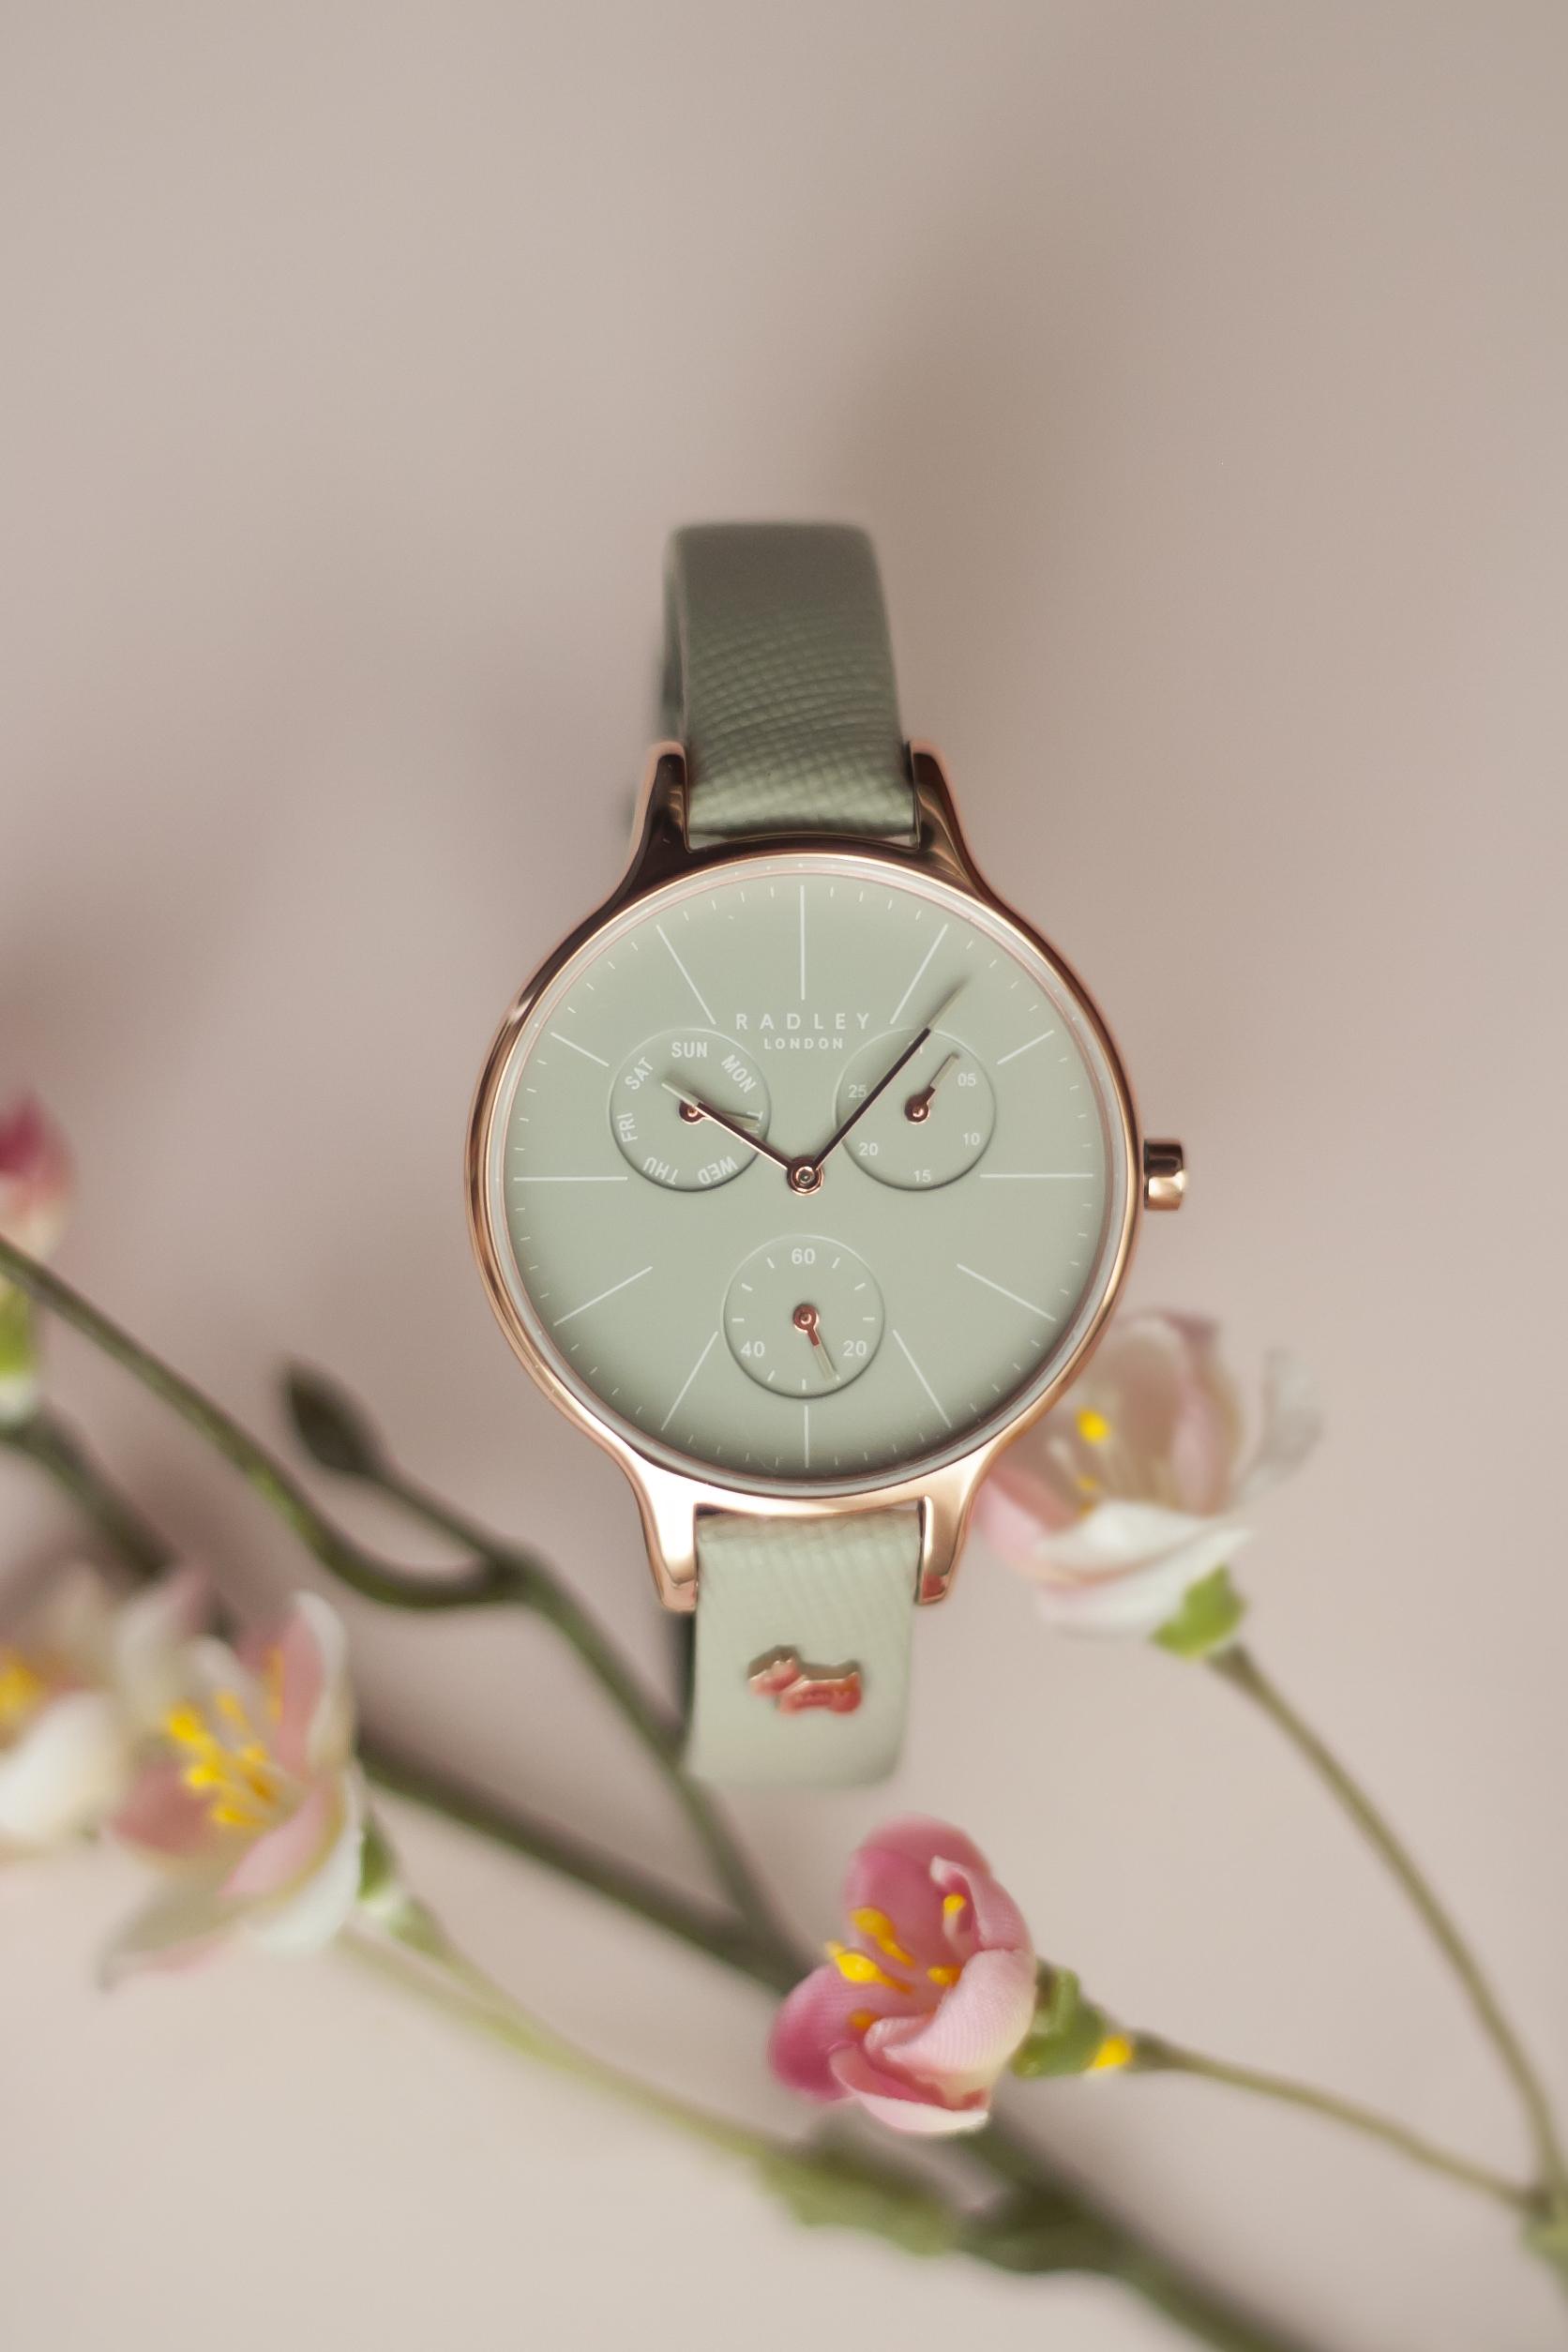 Ladies, Radley wrist watch.